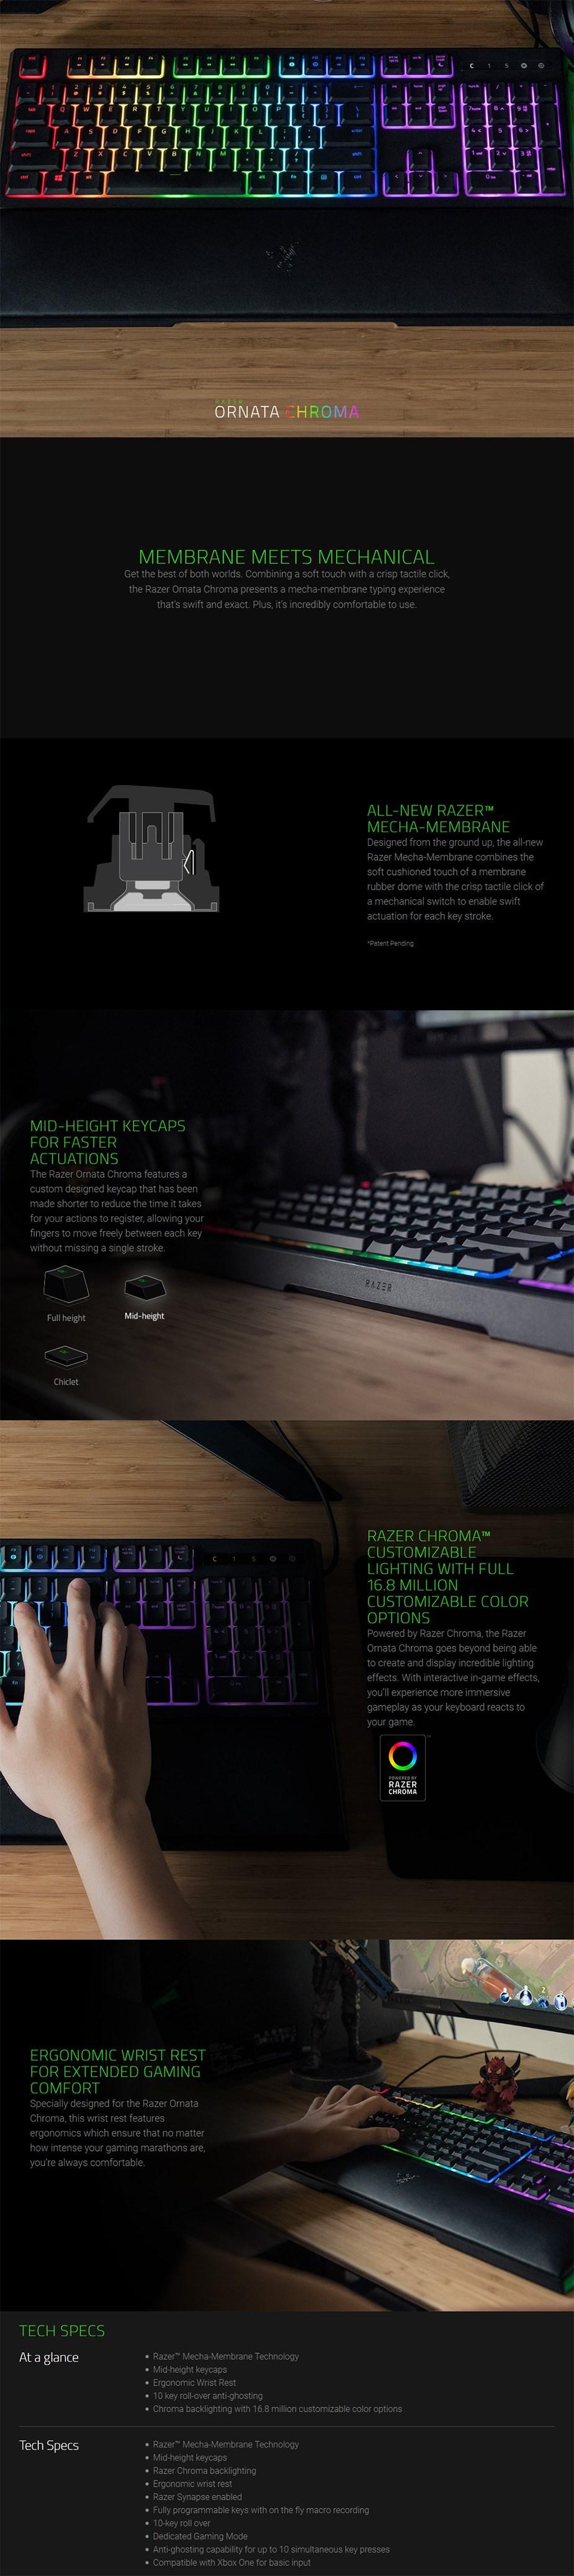 Razer Ornata Chroma Membrane Mechanical Gaming Keyboard